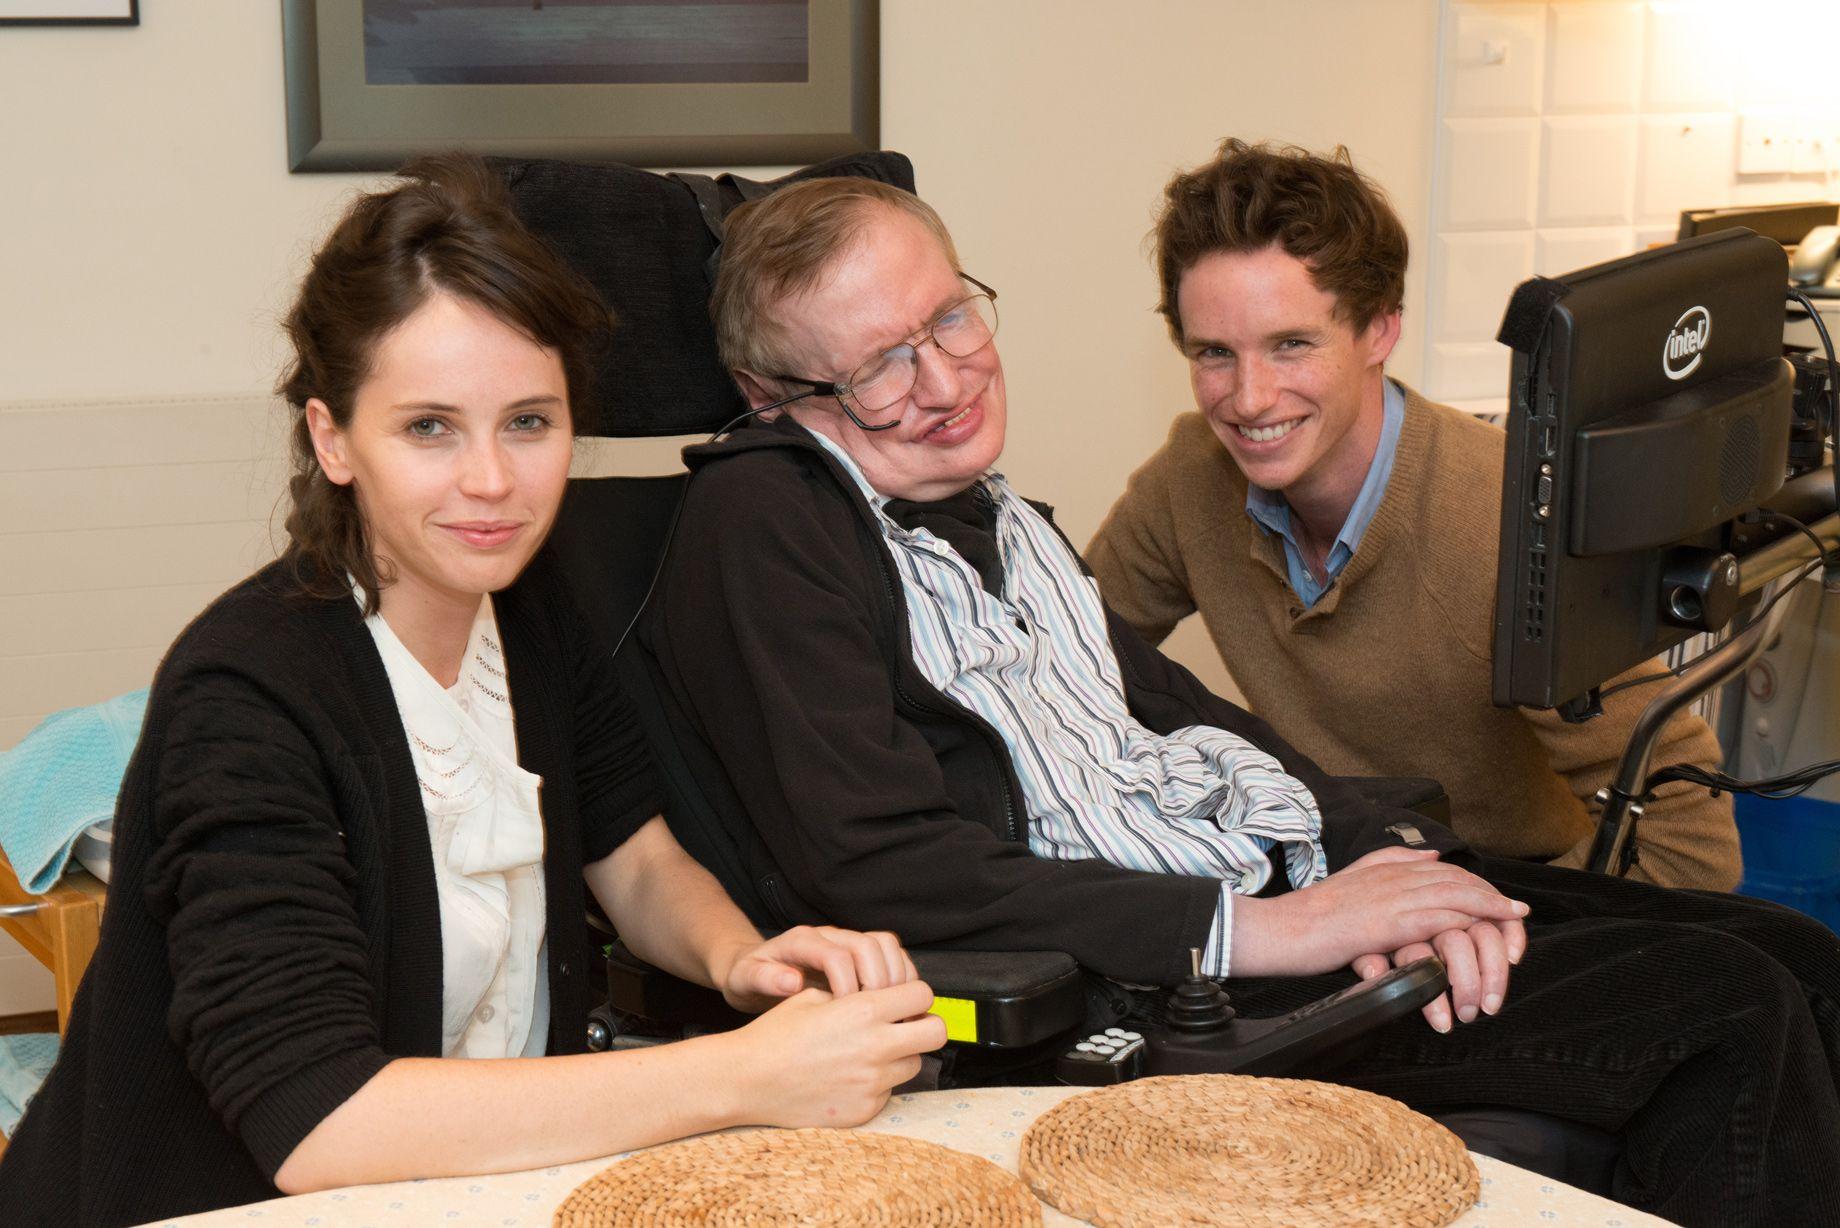 Eddie Redmayne e Felicity Jones in compagnia di Stephen Hawking durante le riprese di Theory of Everything